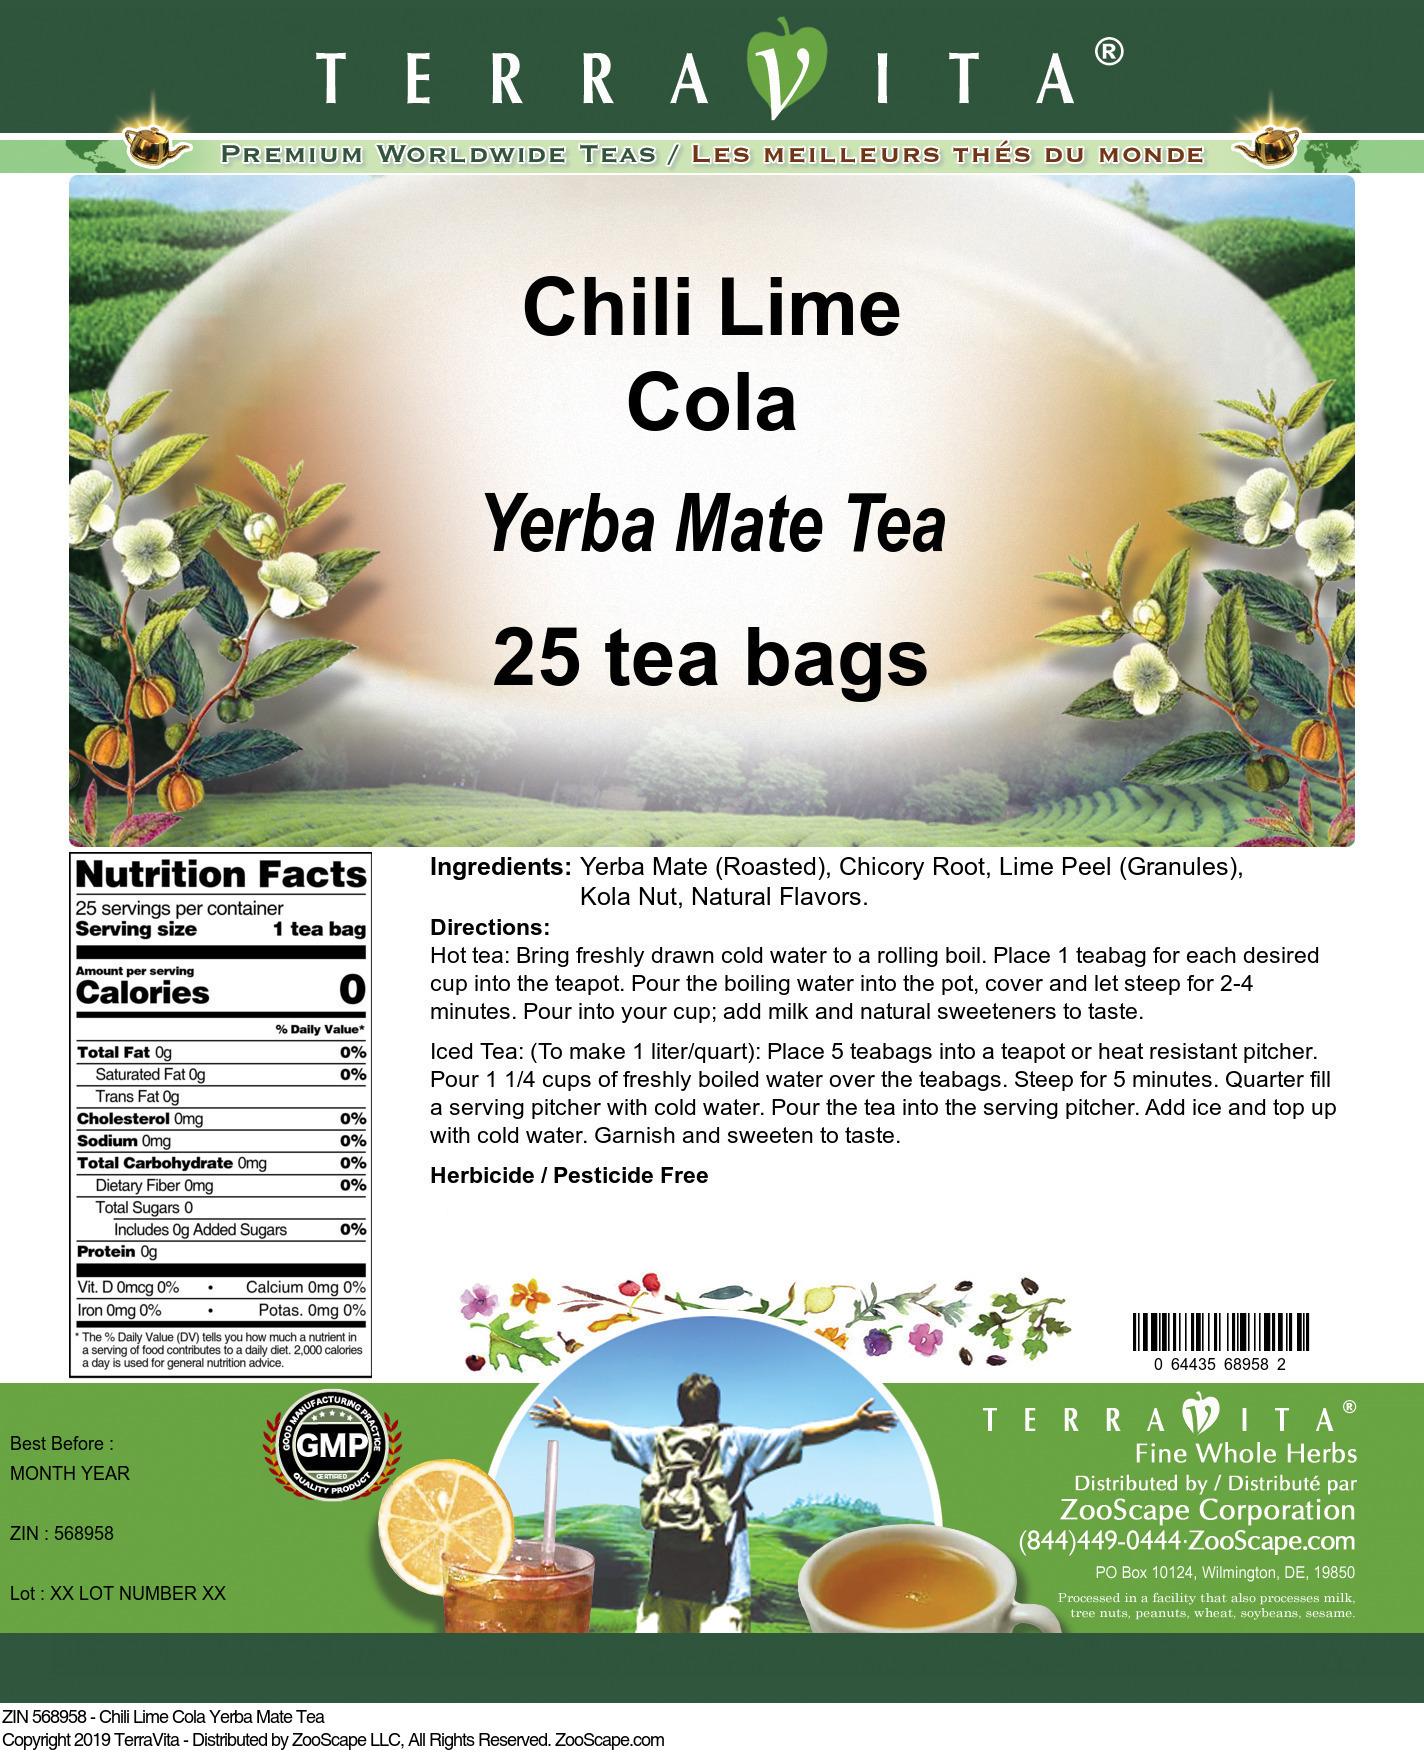 Chili Lime Cola Yerba Mate